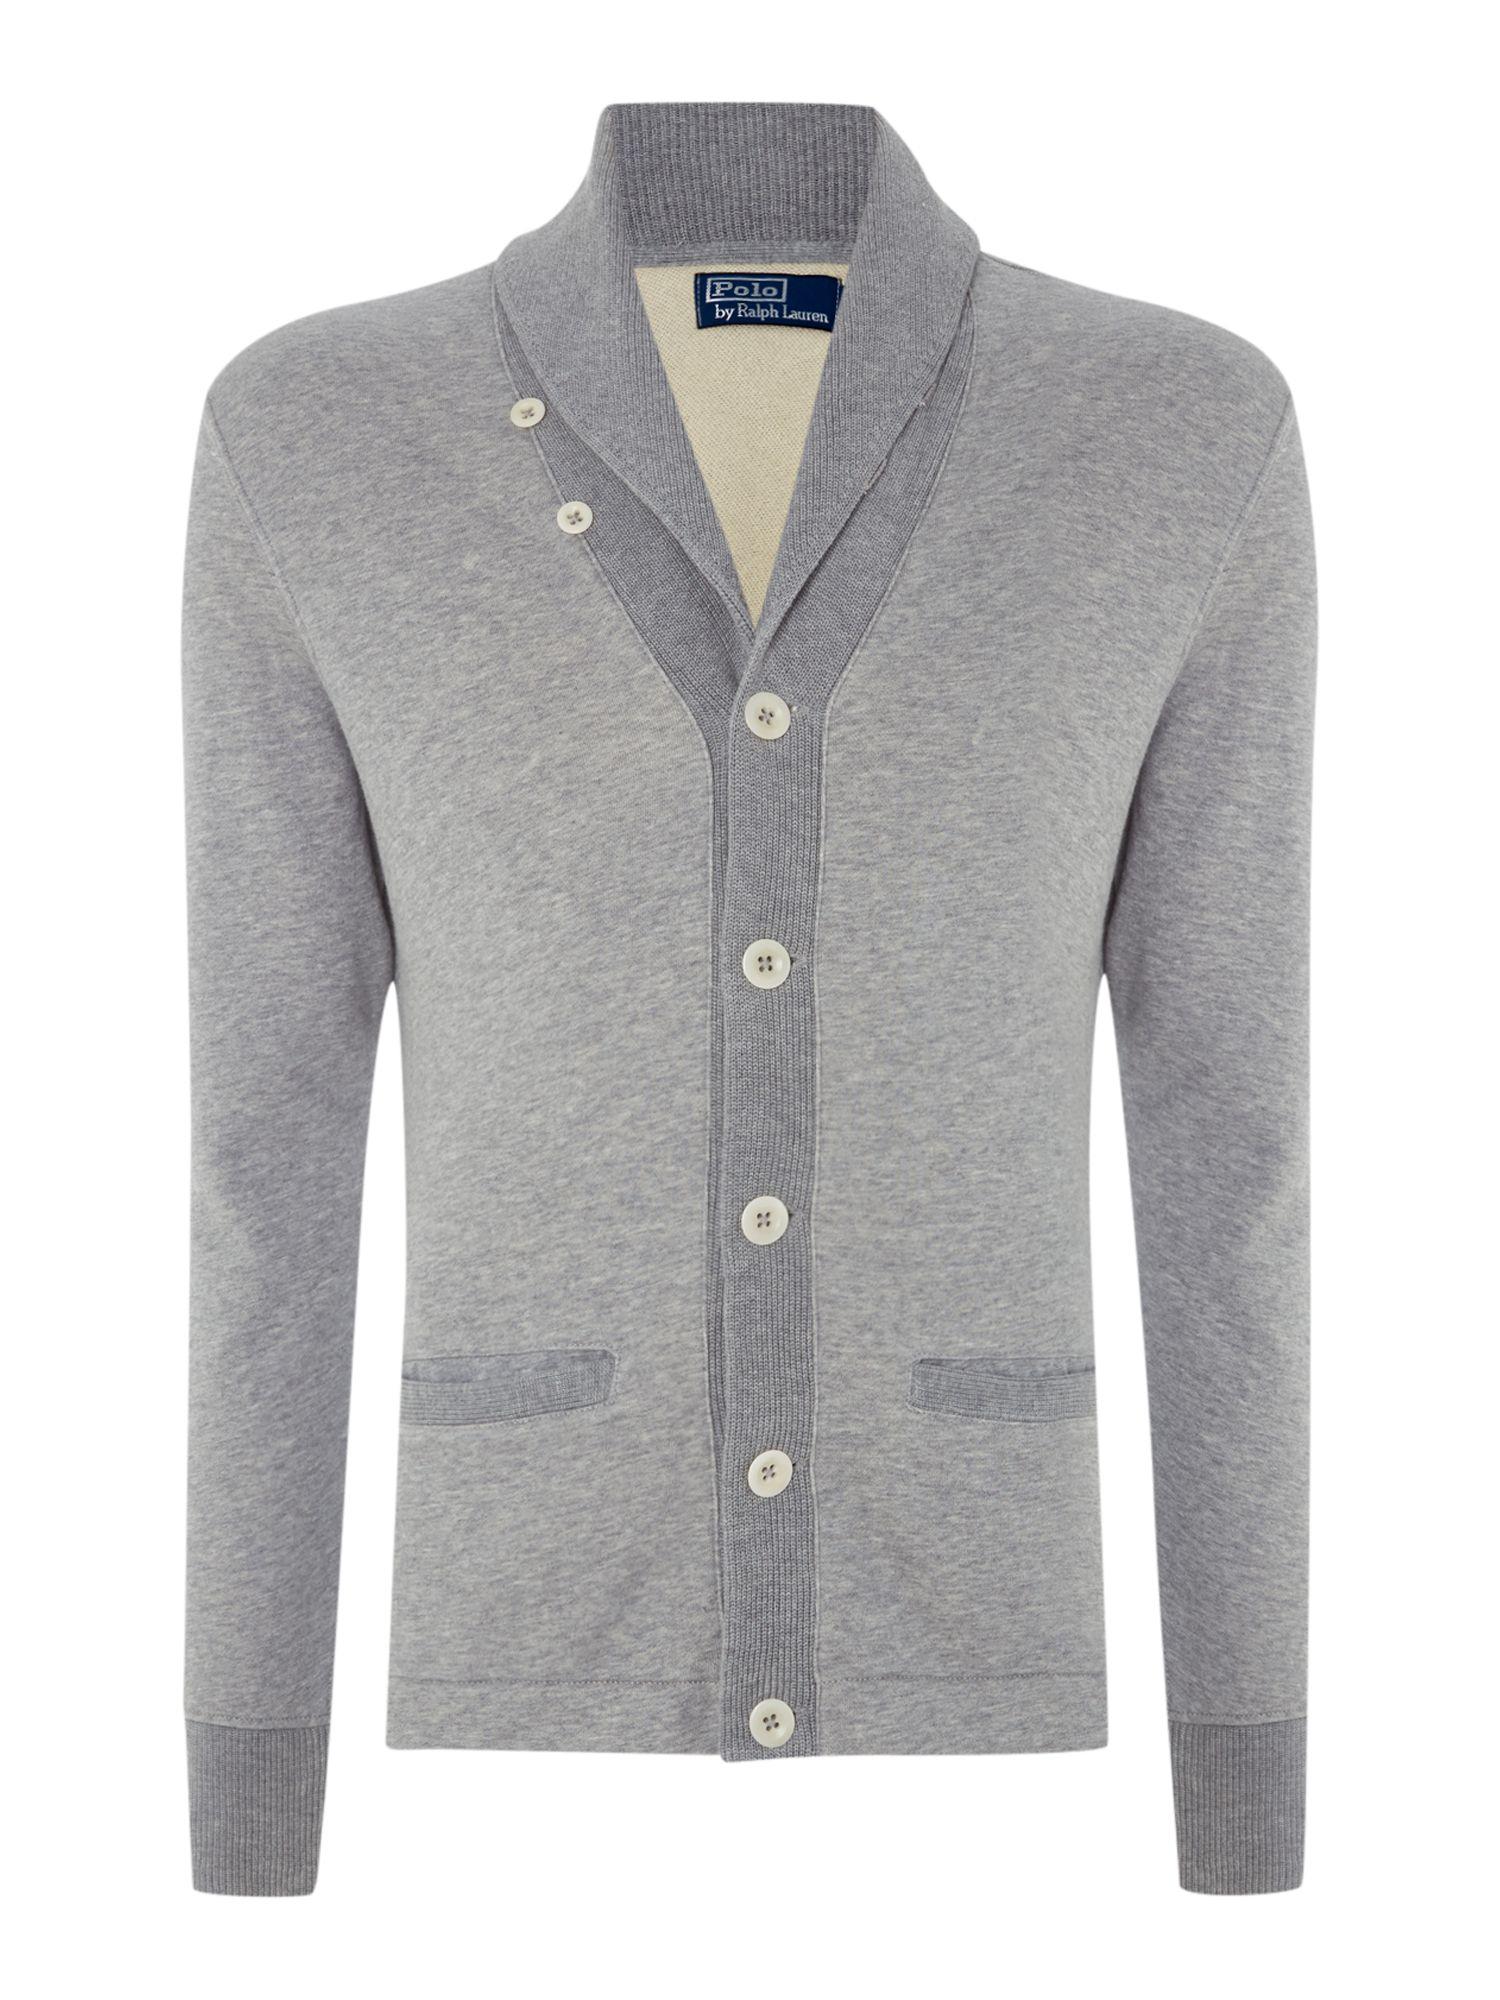 Lyst polo ralph lauren heavy knit shawl collar button for Heavy button down shirts